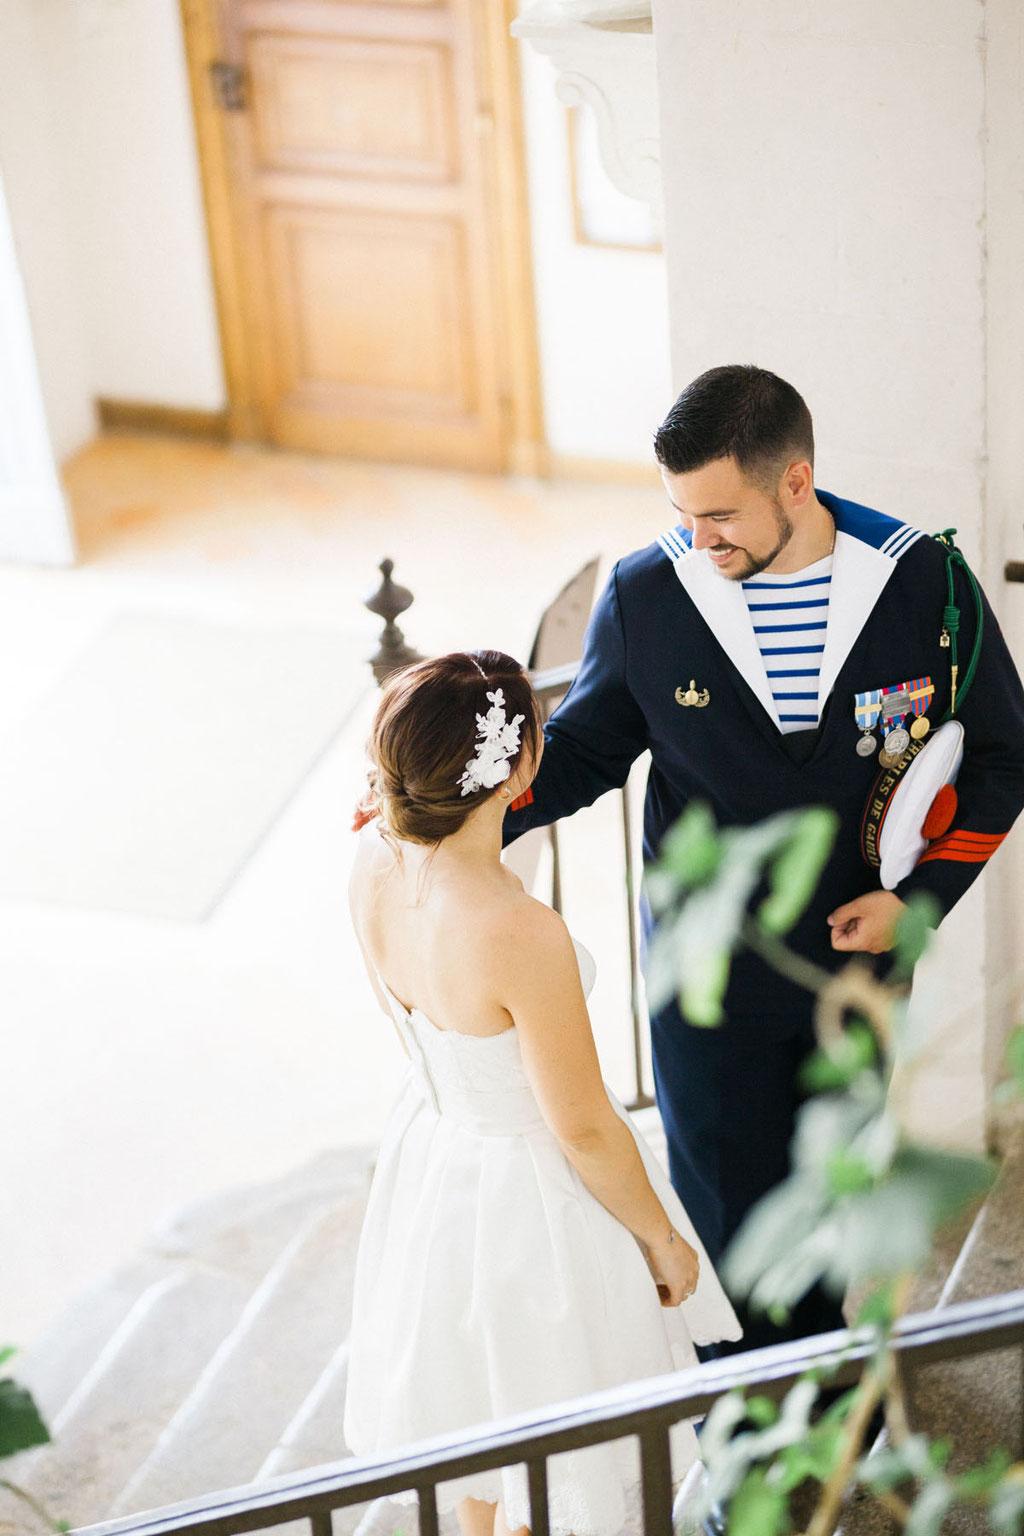 Manoir de la fresynaye mariage Bretagne Orlane Boisard couple 2